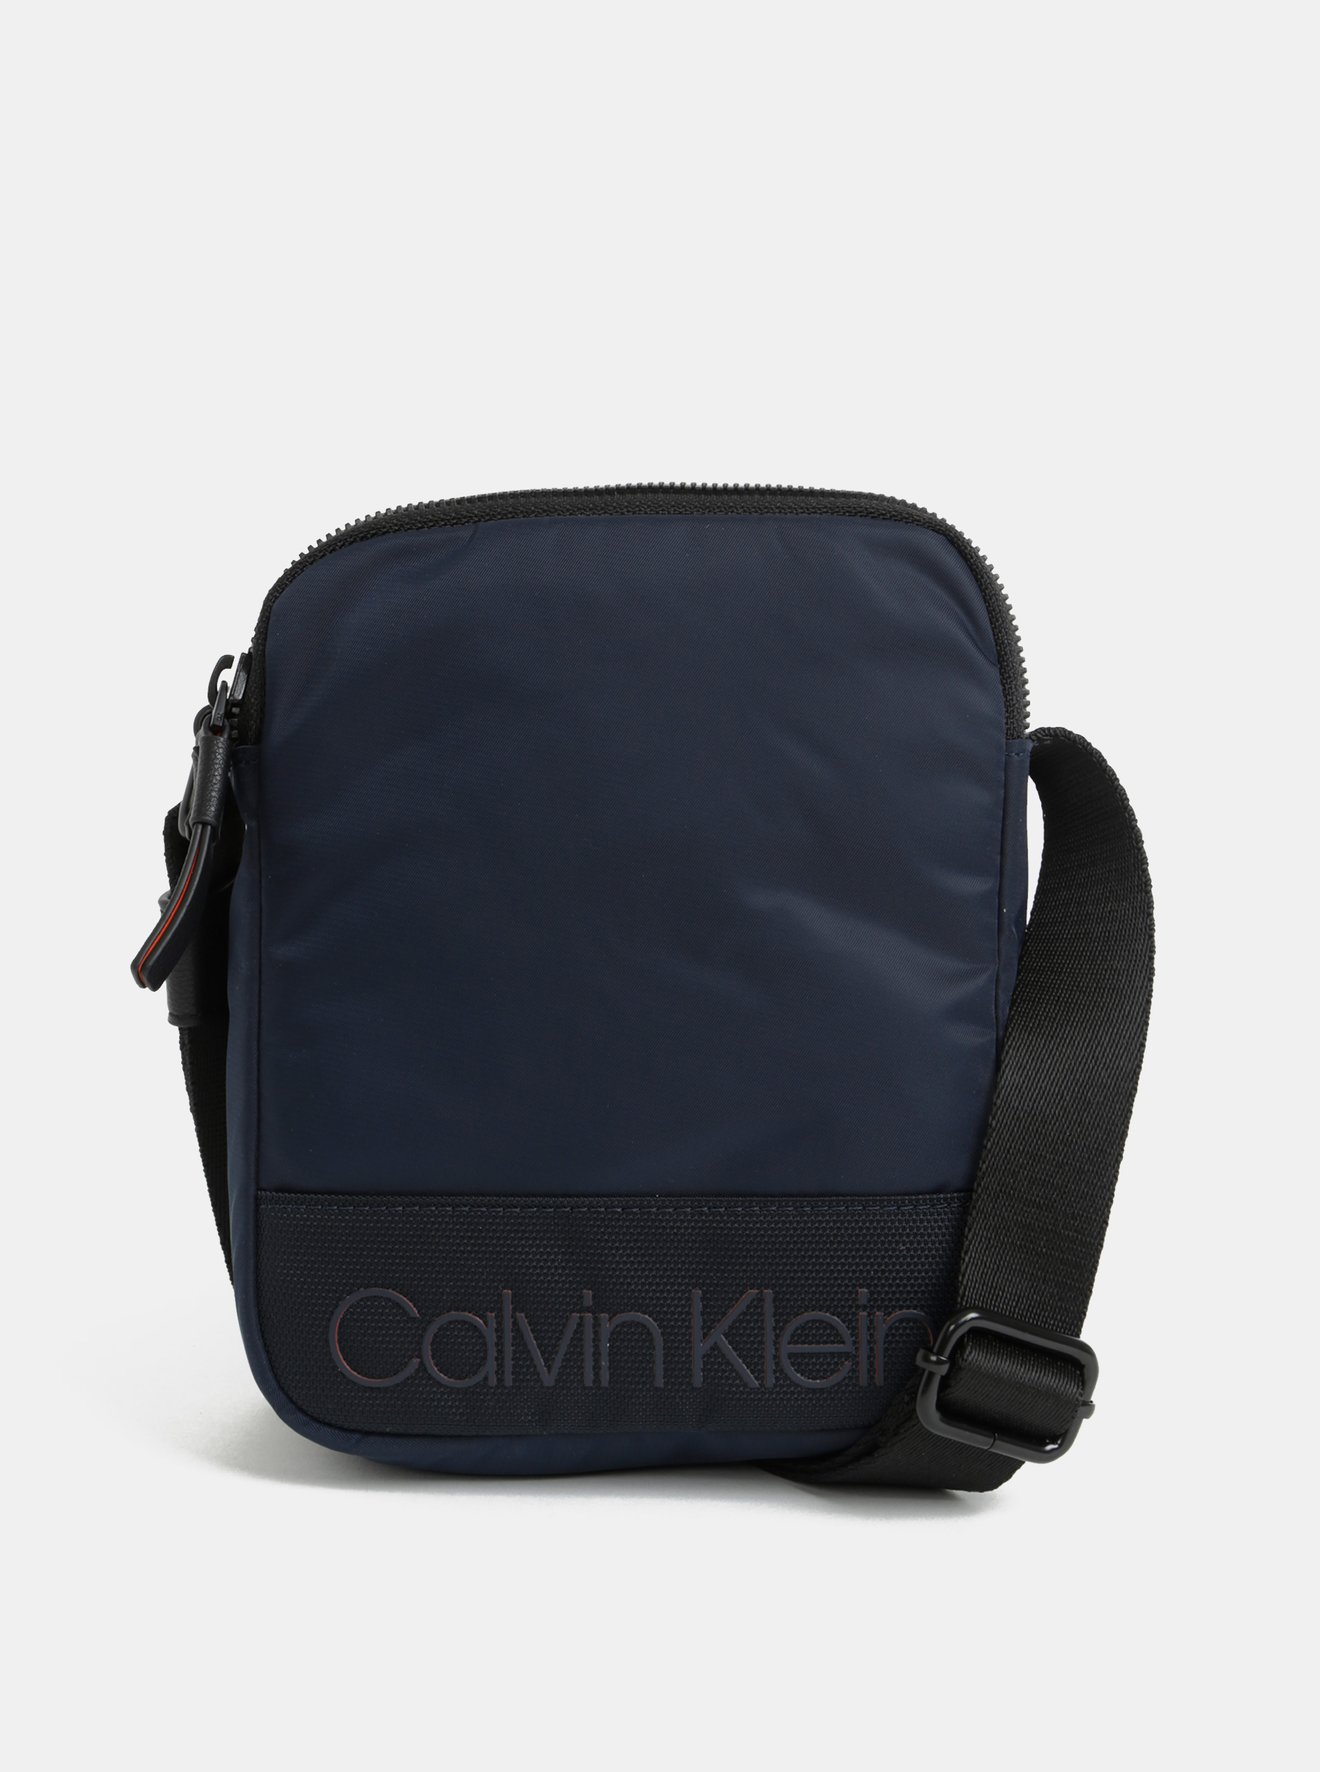 17592c9306 Tmavě modrá pánská crossbody taška Calvin Klein Jeans - SLEVA ...